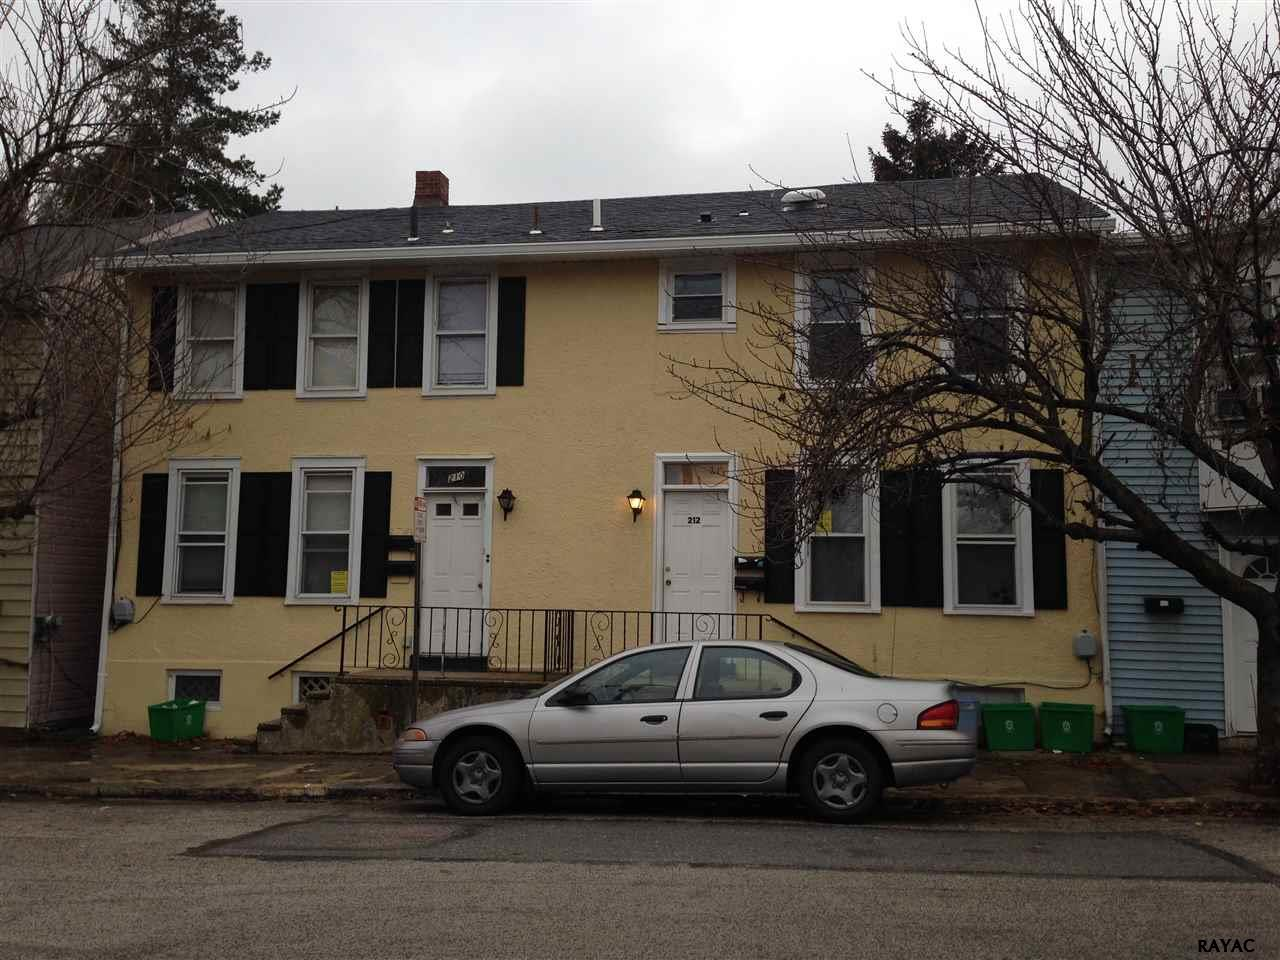 212 N Penn St, York, PA 17401